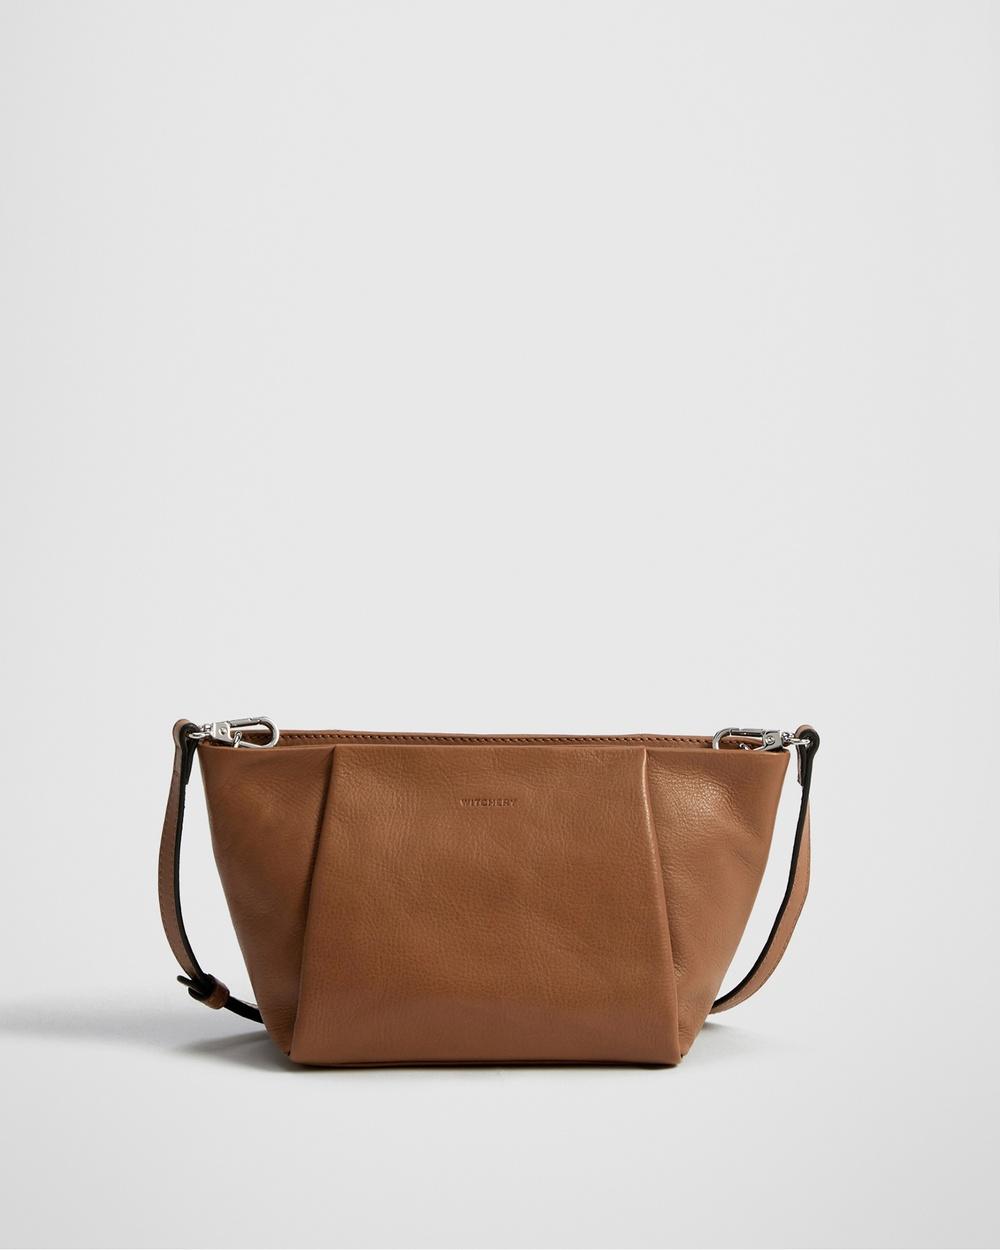 Witchery Celia Mini Soft Crossbody Bag Bags brown Laptop Bags Australia